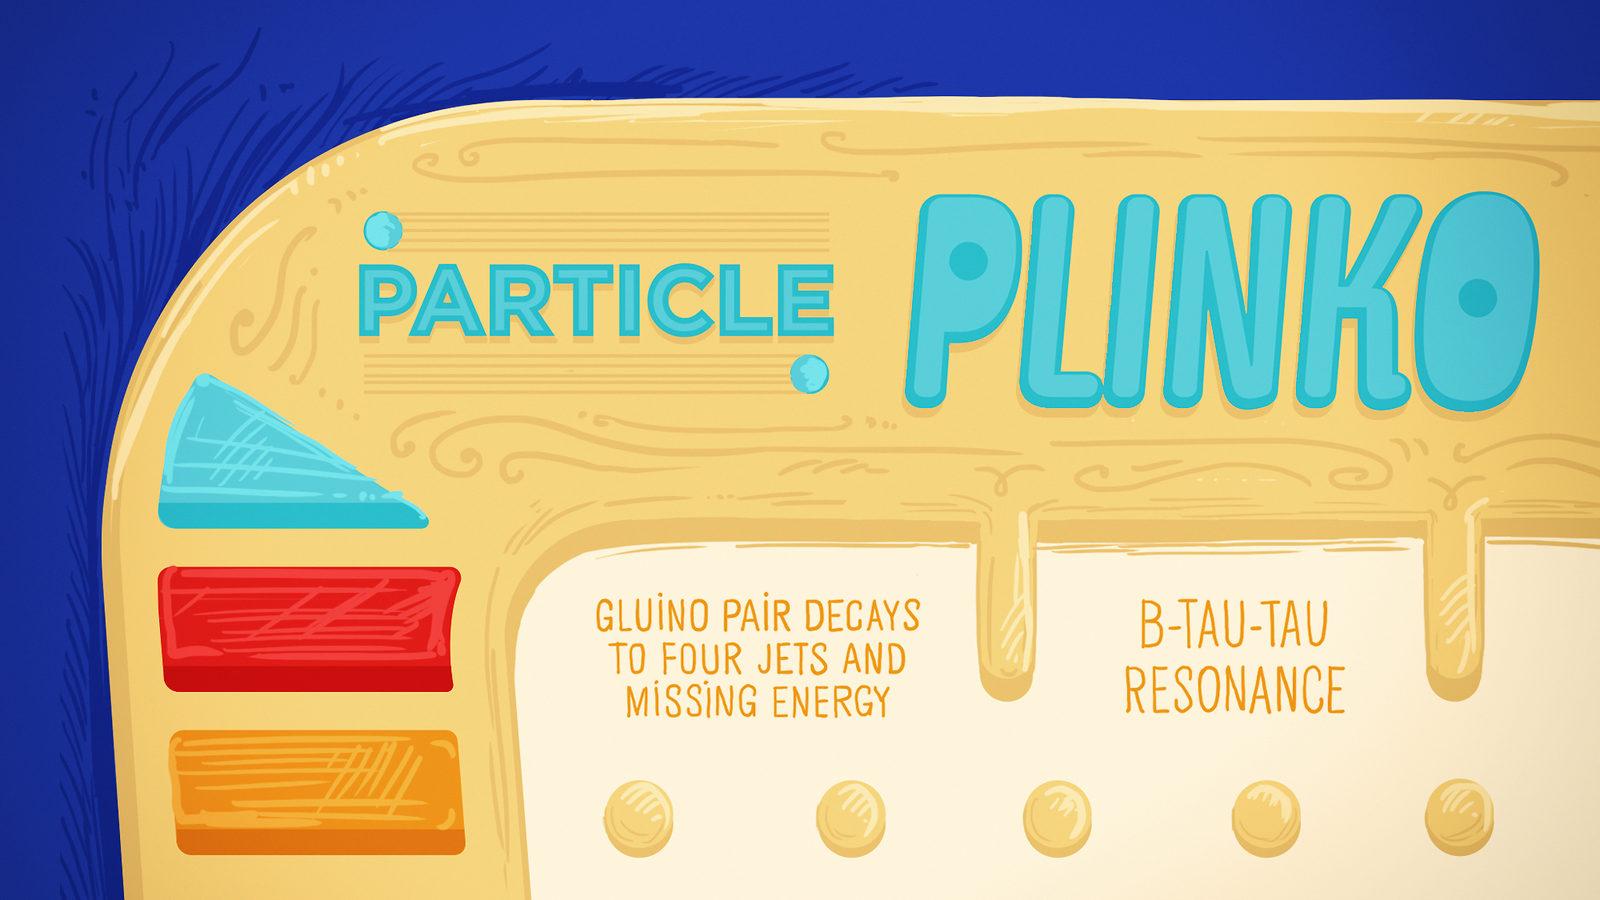 Feature: Particle Plinko